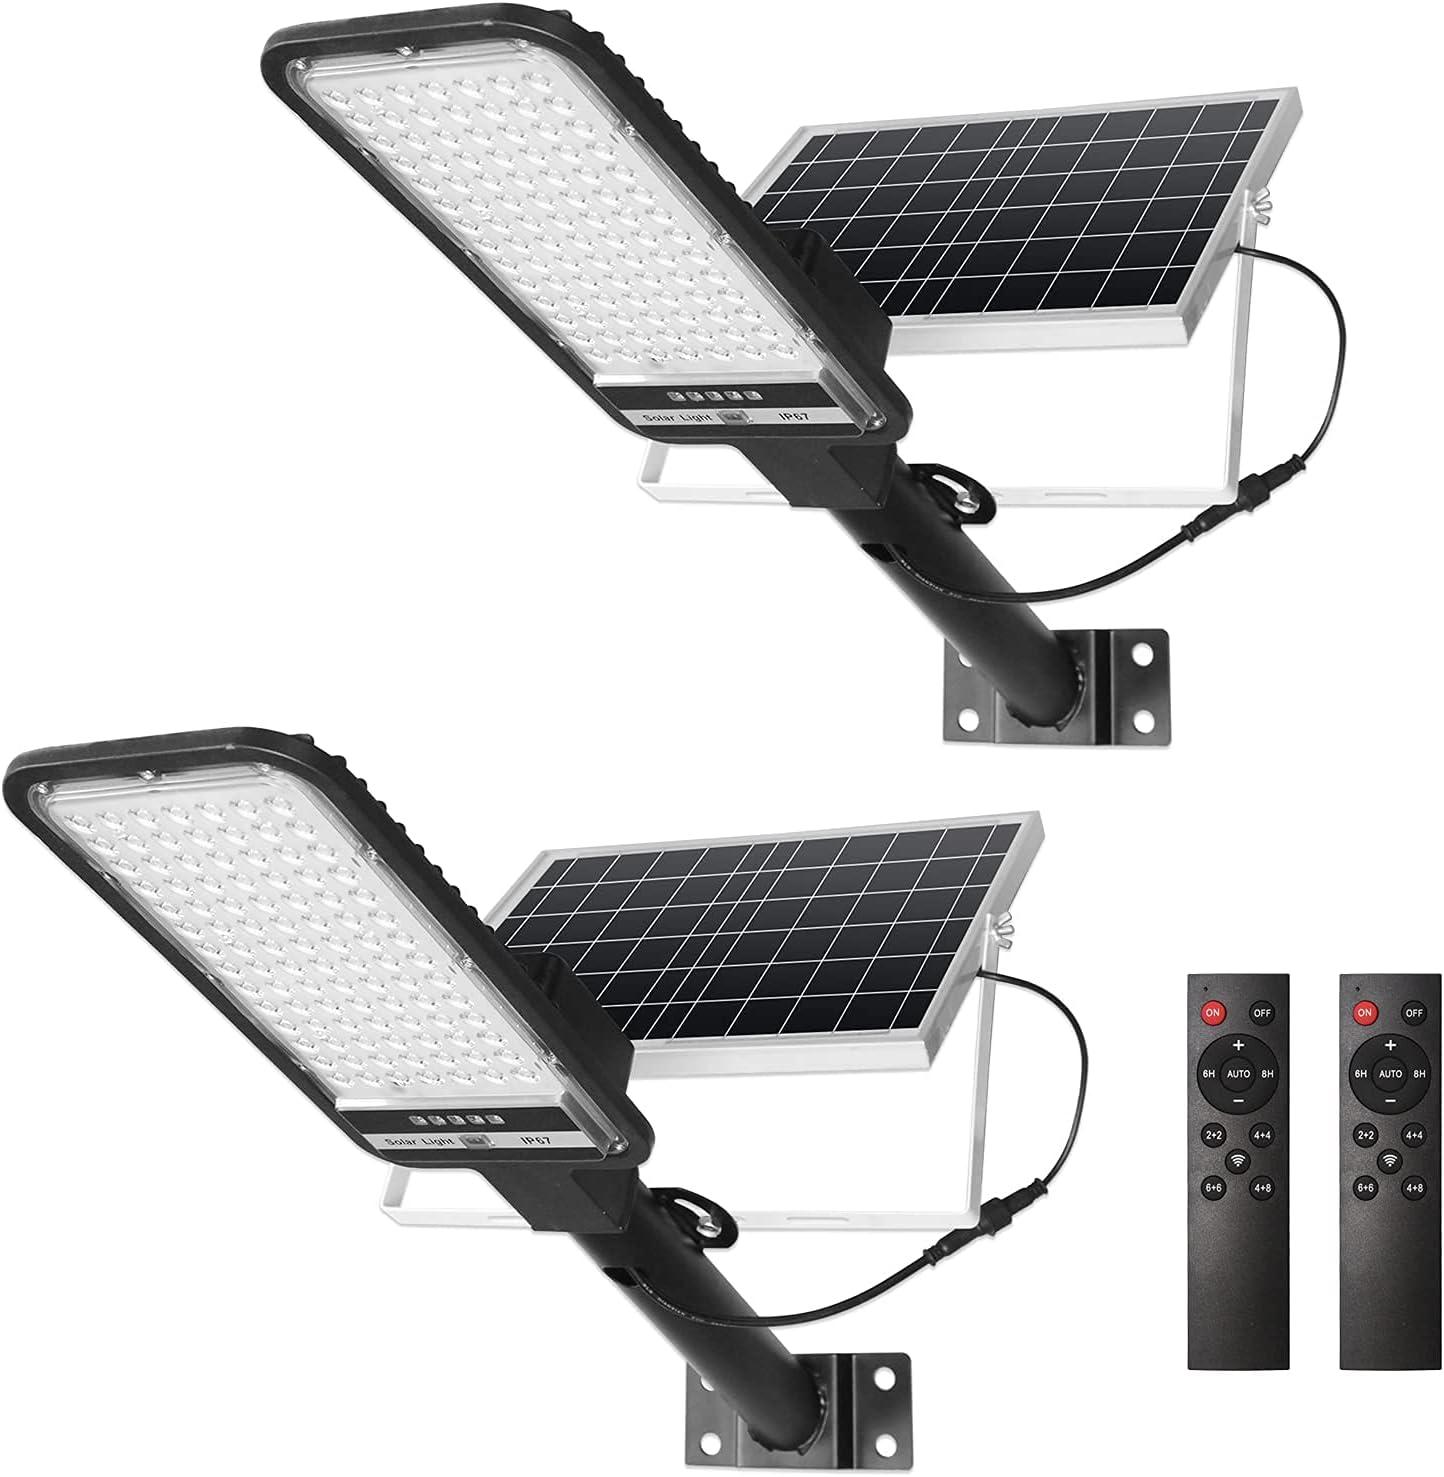 NIORSUN 100W Solar Street Lights 2 Flood Light Lig Ranking TOP19 Set Popular shop is the lowest price challenge Security